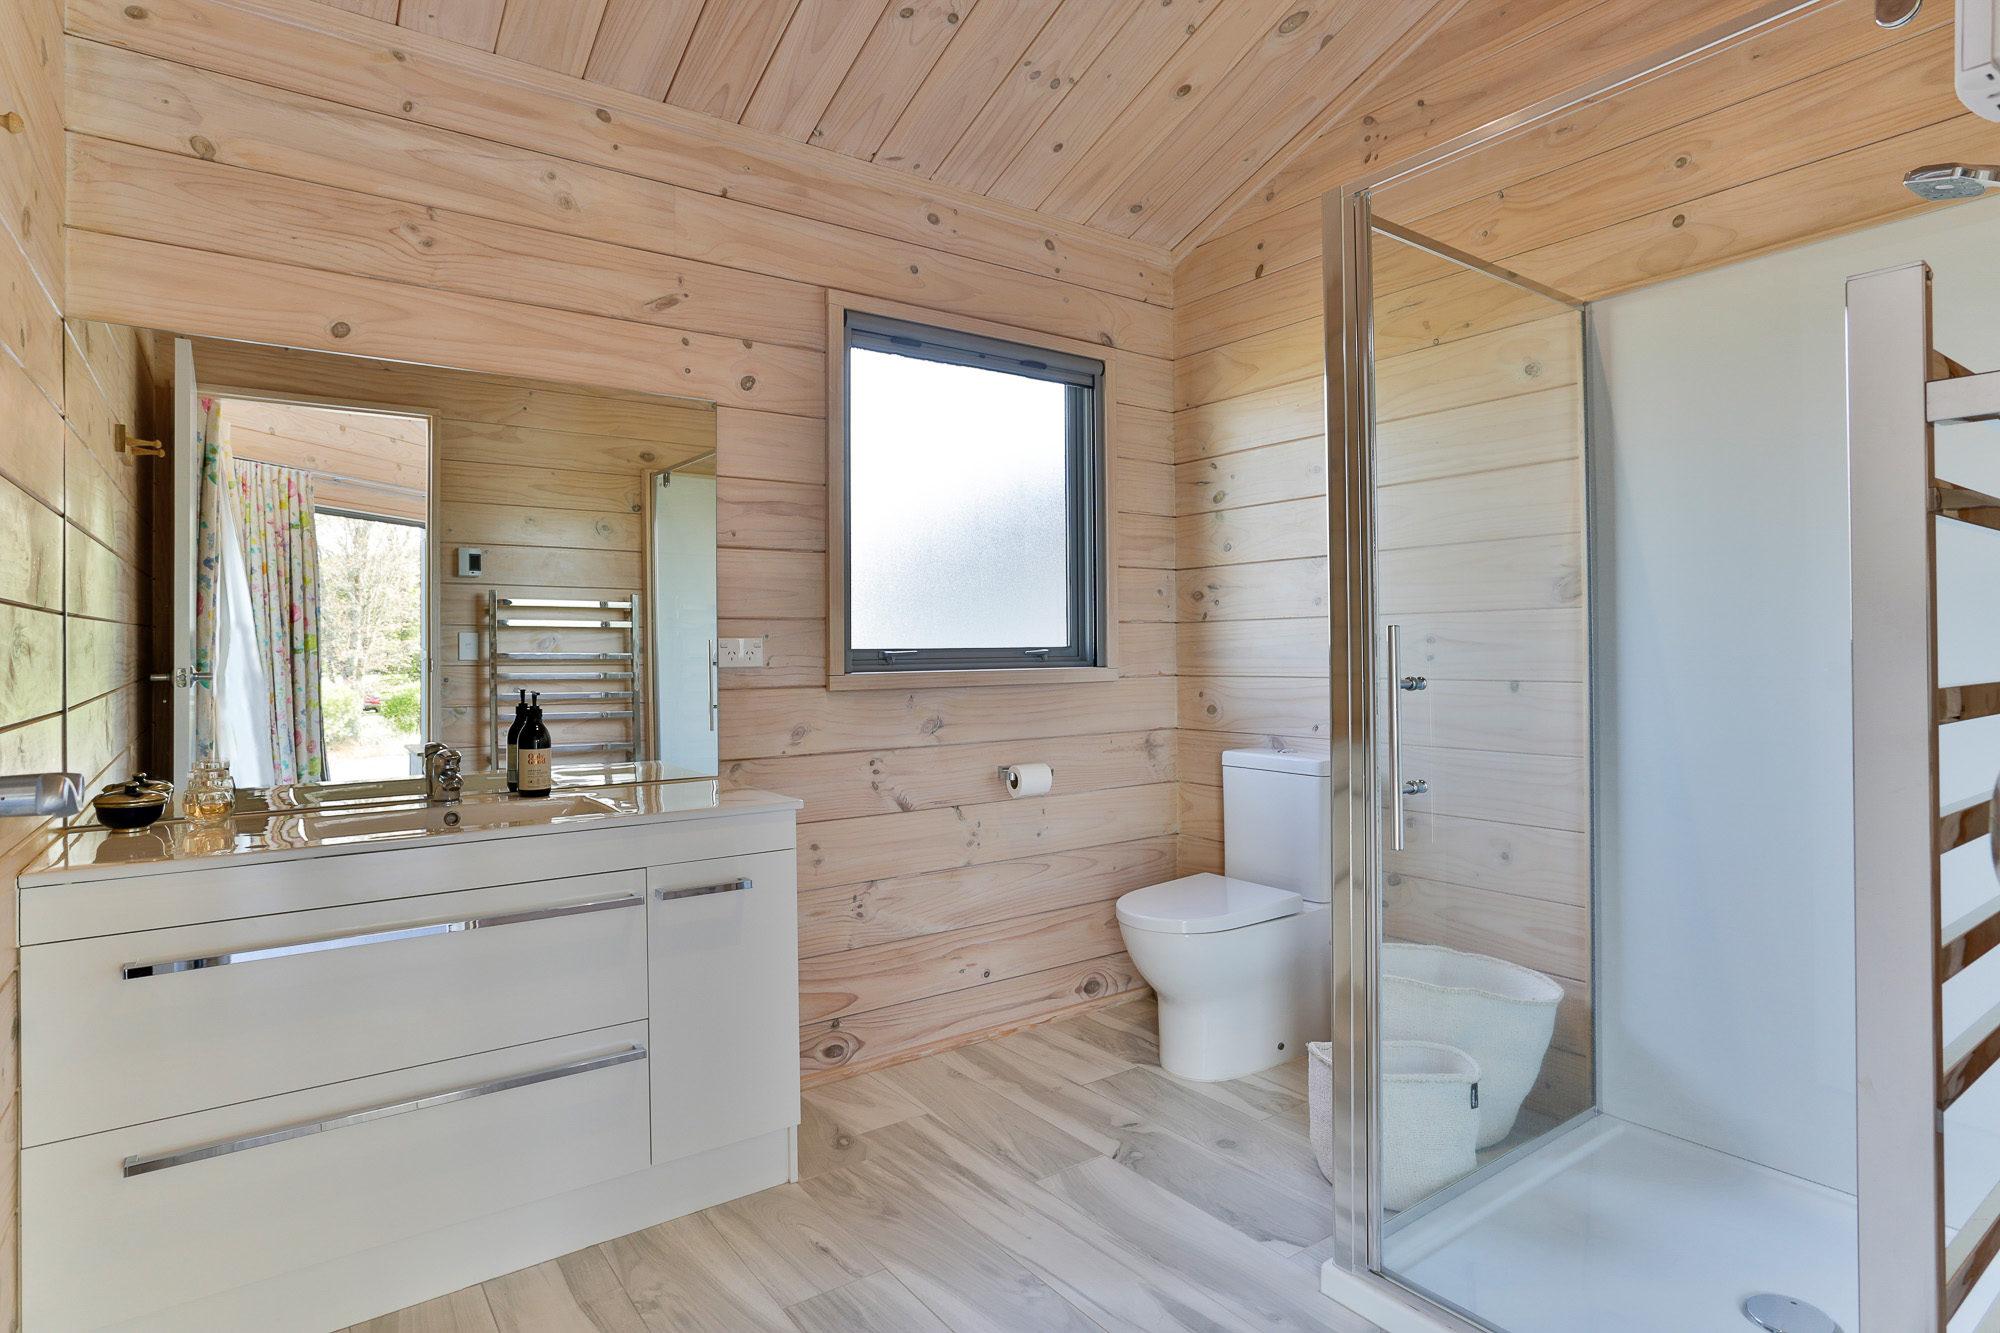 Bathroom in Lockwood home light blonded timber